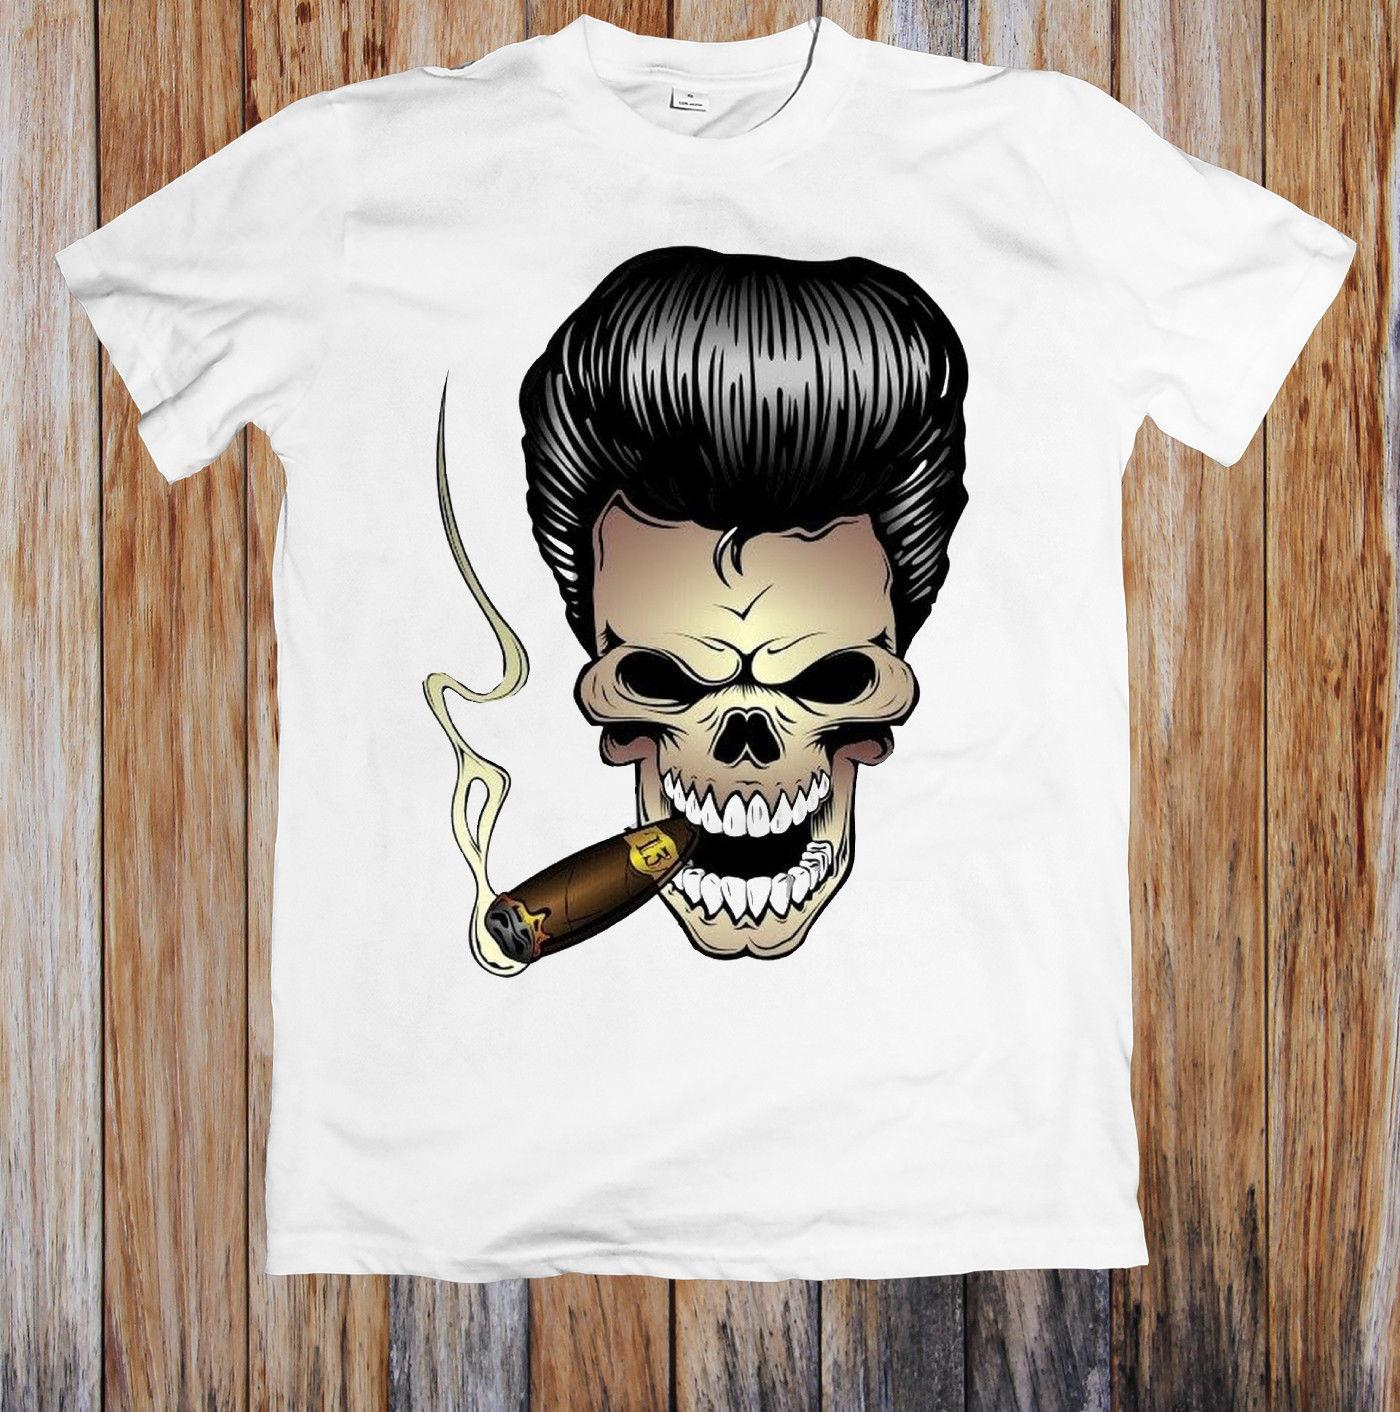 3ae2b0bae545a ROCKABILLY SKULL WITH CIGAR UNISEX T-SHIRT Men Funny O Neck Short Sleeve  Cotton T-Shirt New Fashion Print Free Shipping